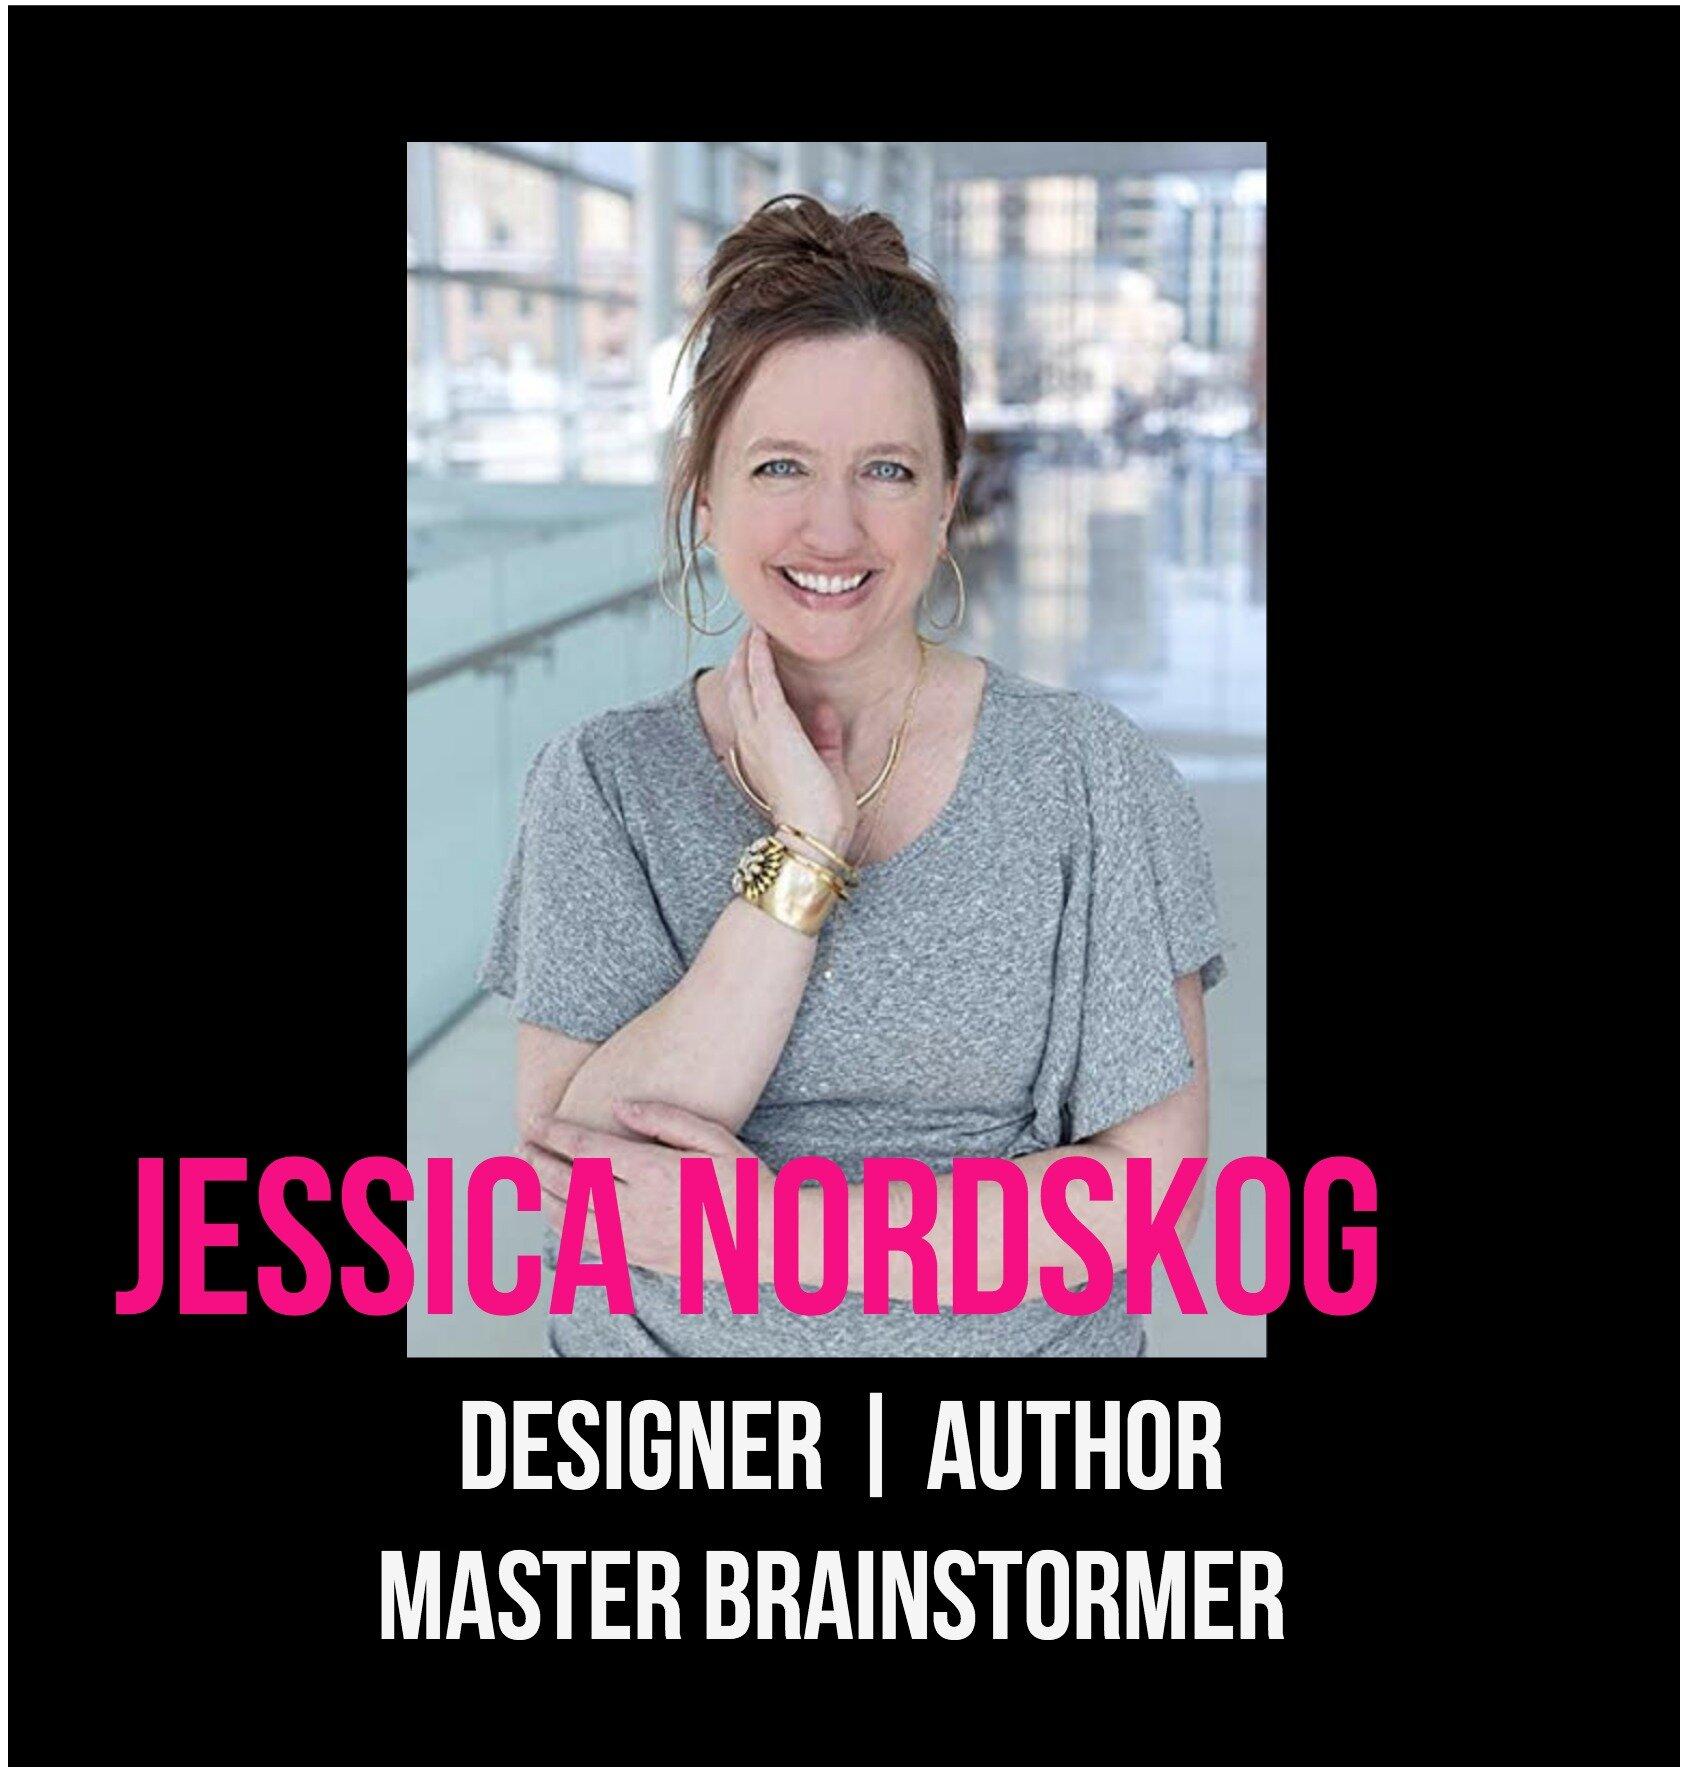 THE JILLS OF ALL TRADES™ Jessica Nordskog Designer Author Master Brainstormer